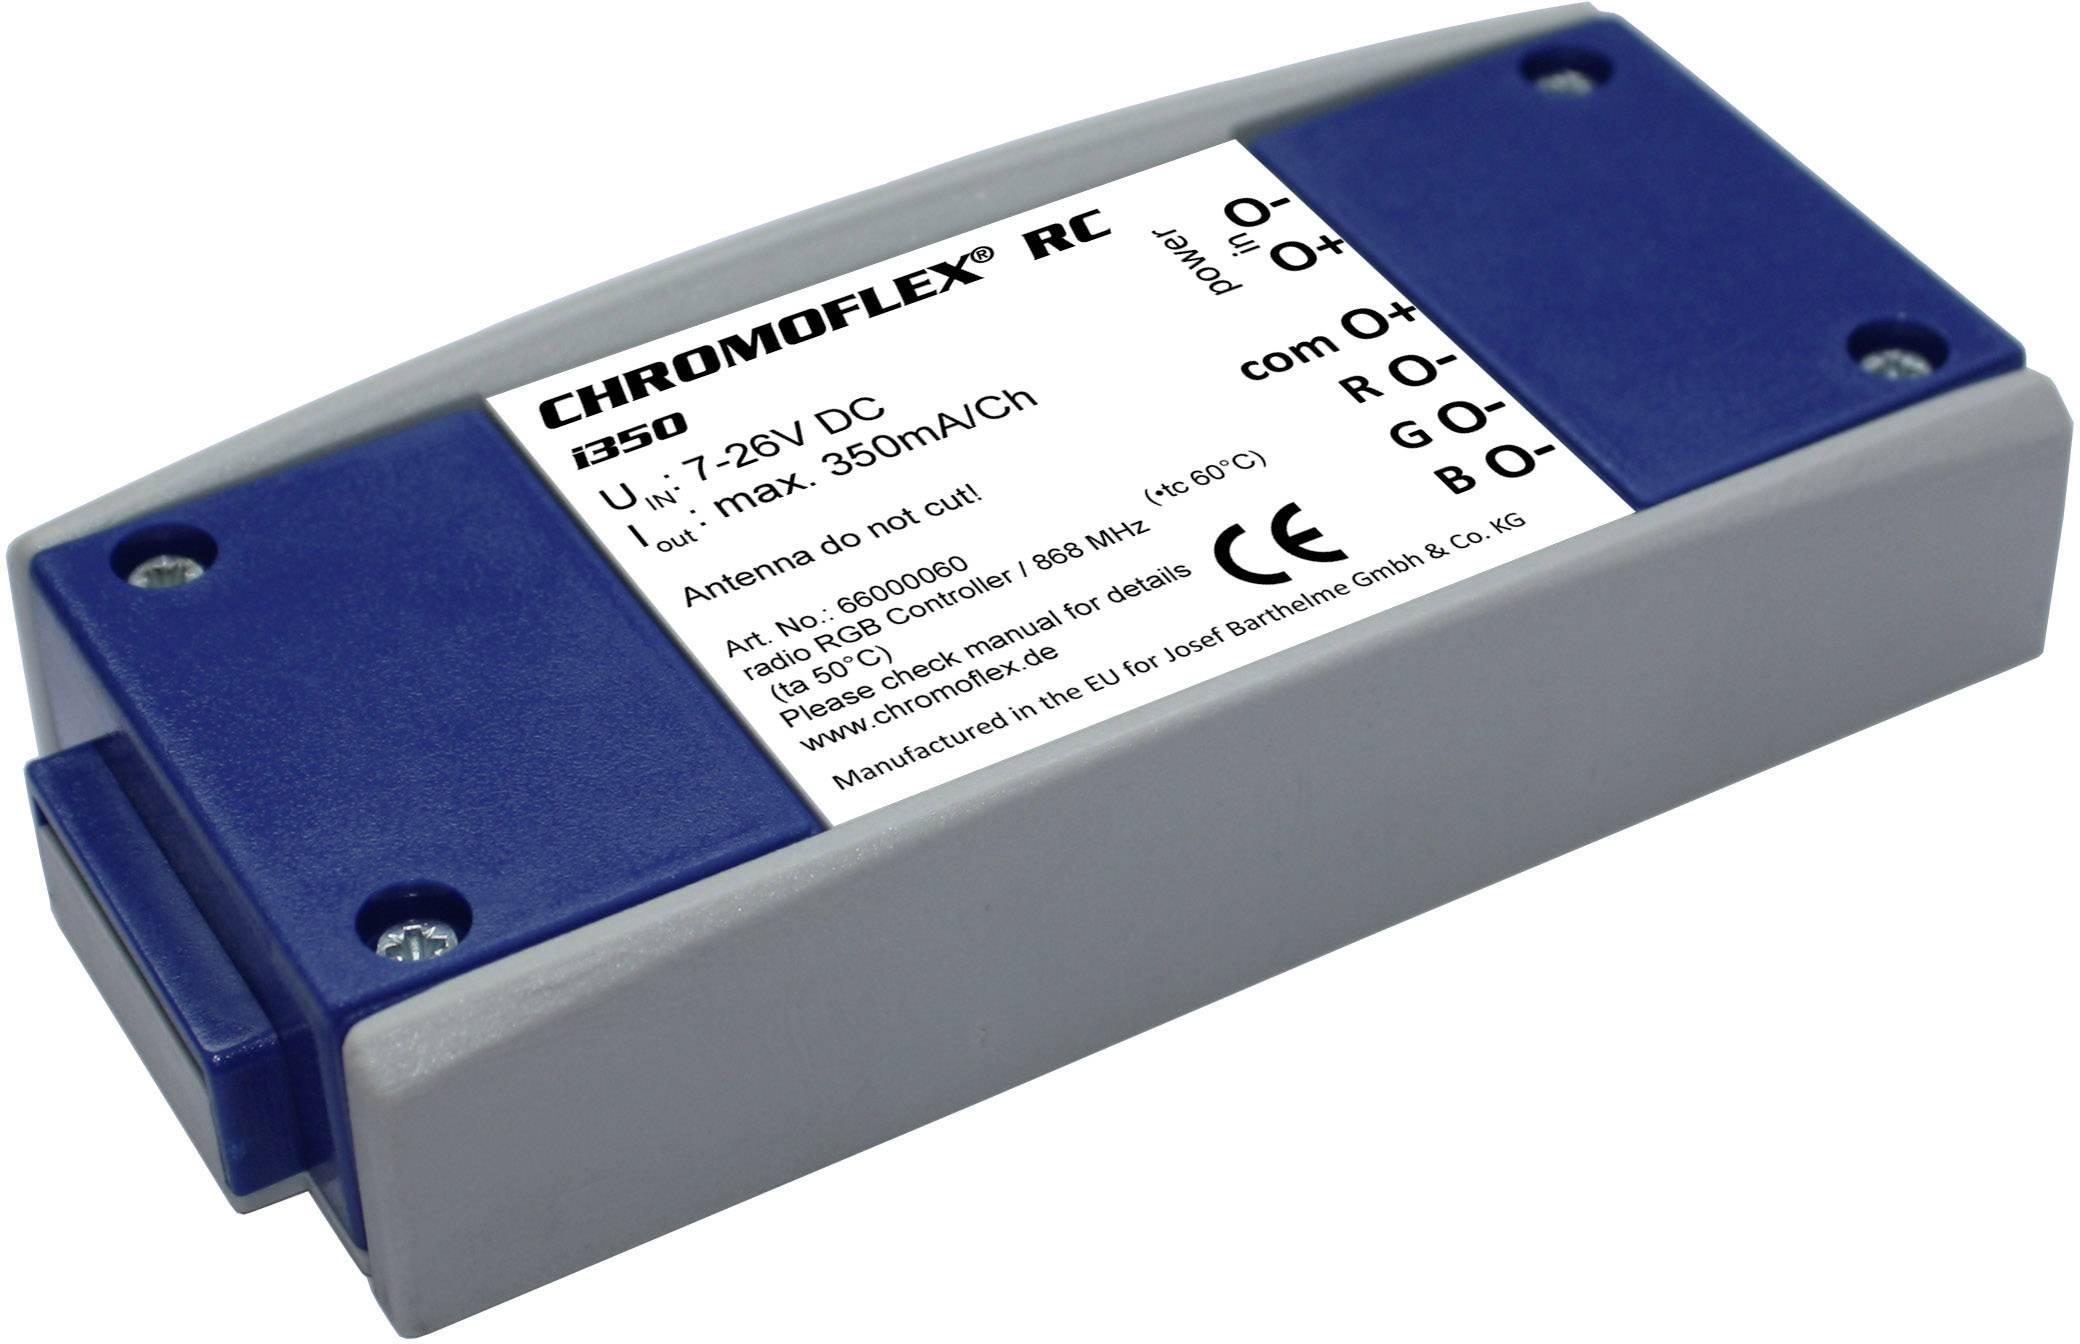 RGB LED řídící jednotka Barthelme Chromoflex RGB III RC I350, 66000060, 7 - 26 V/DC